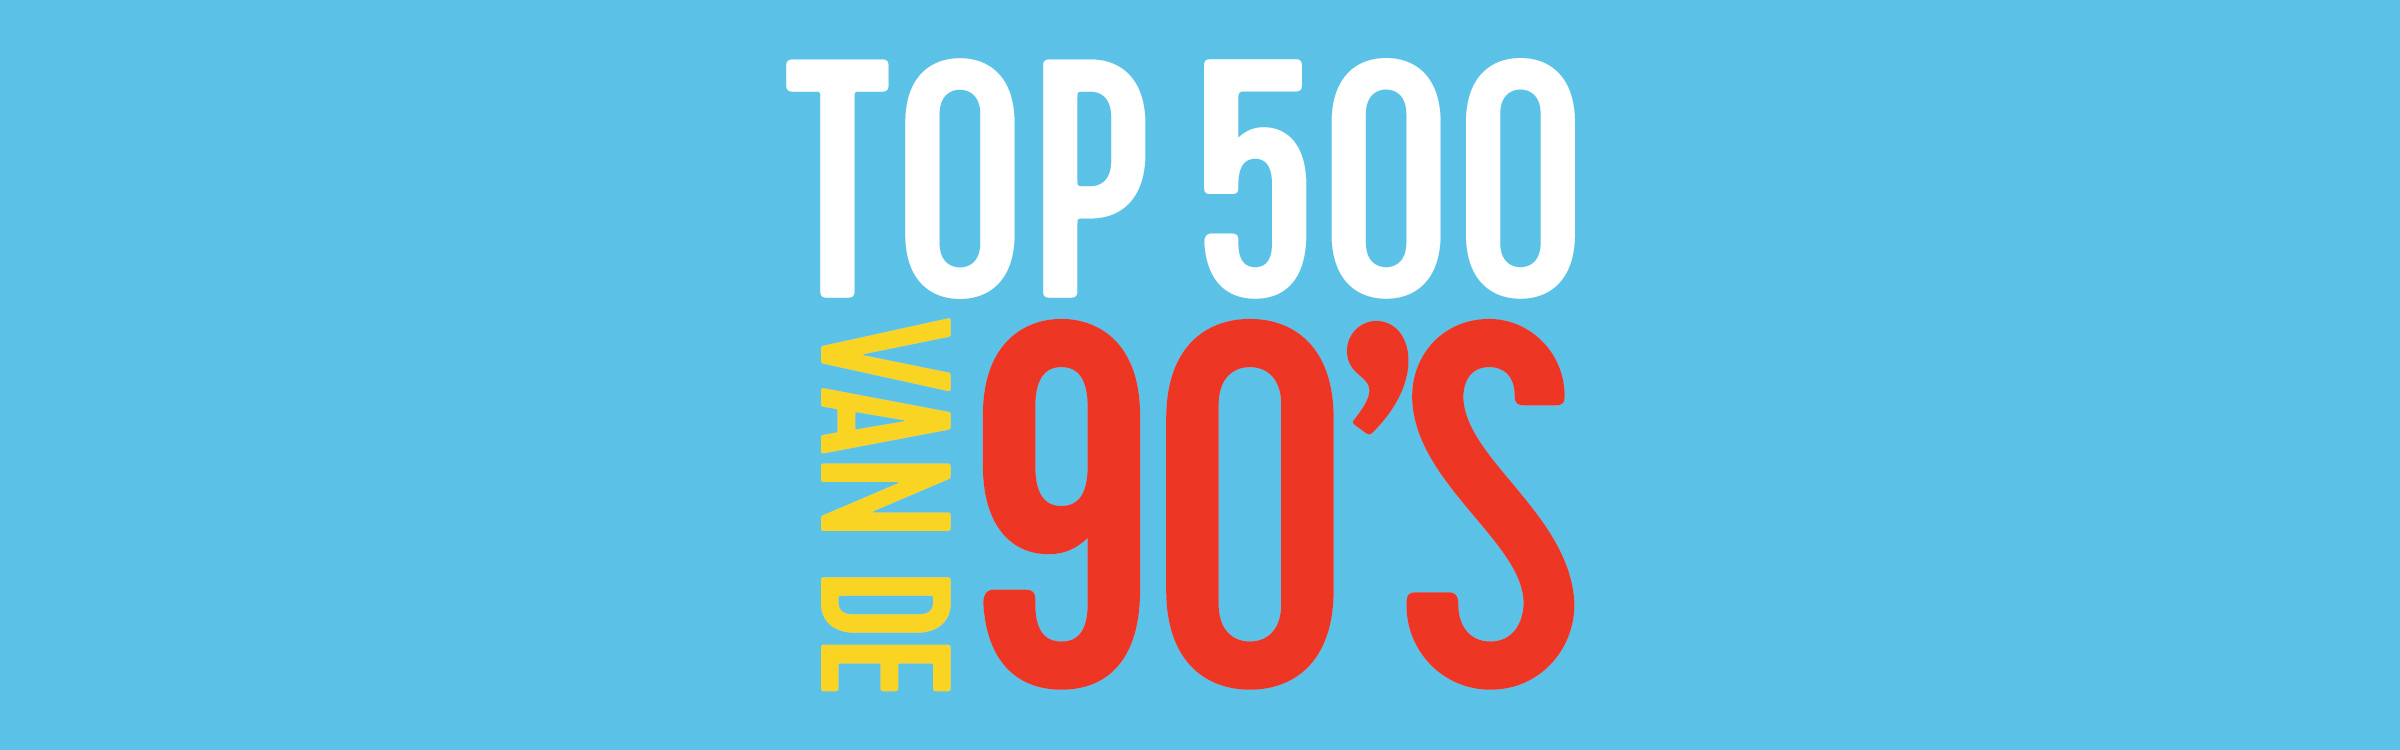 2400x750 top500vd90s default